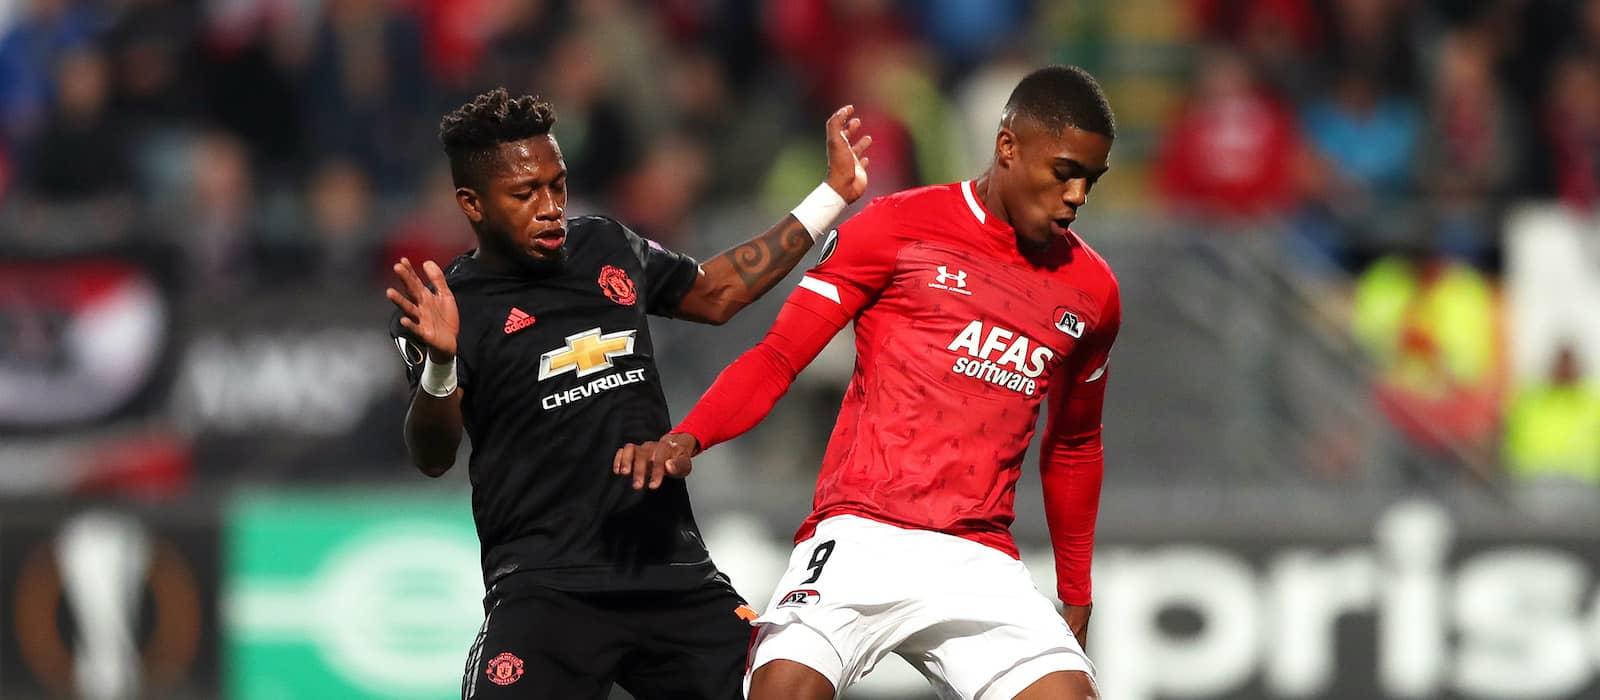 AZ Alkmaar's Myron Boadu may be ideal Manchester United signing